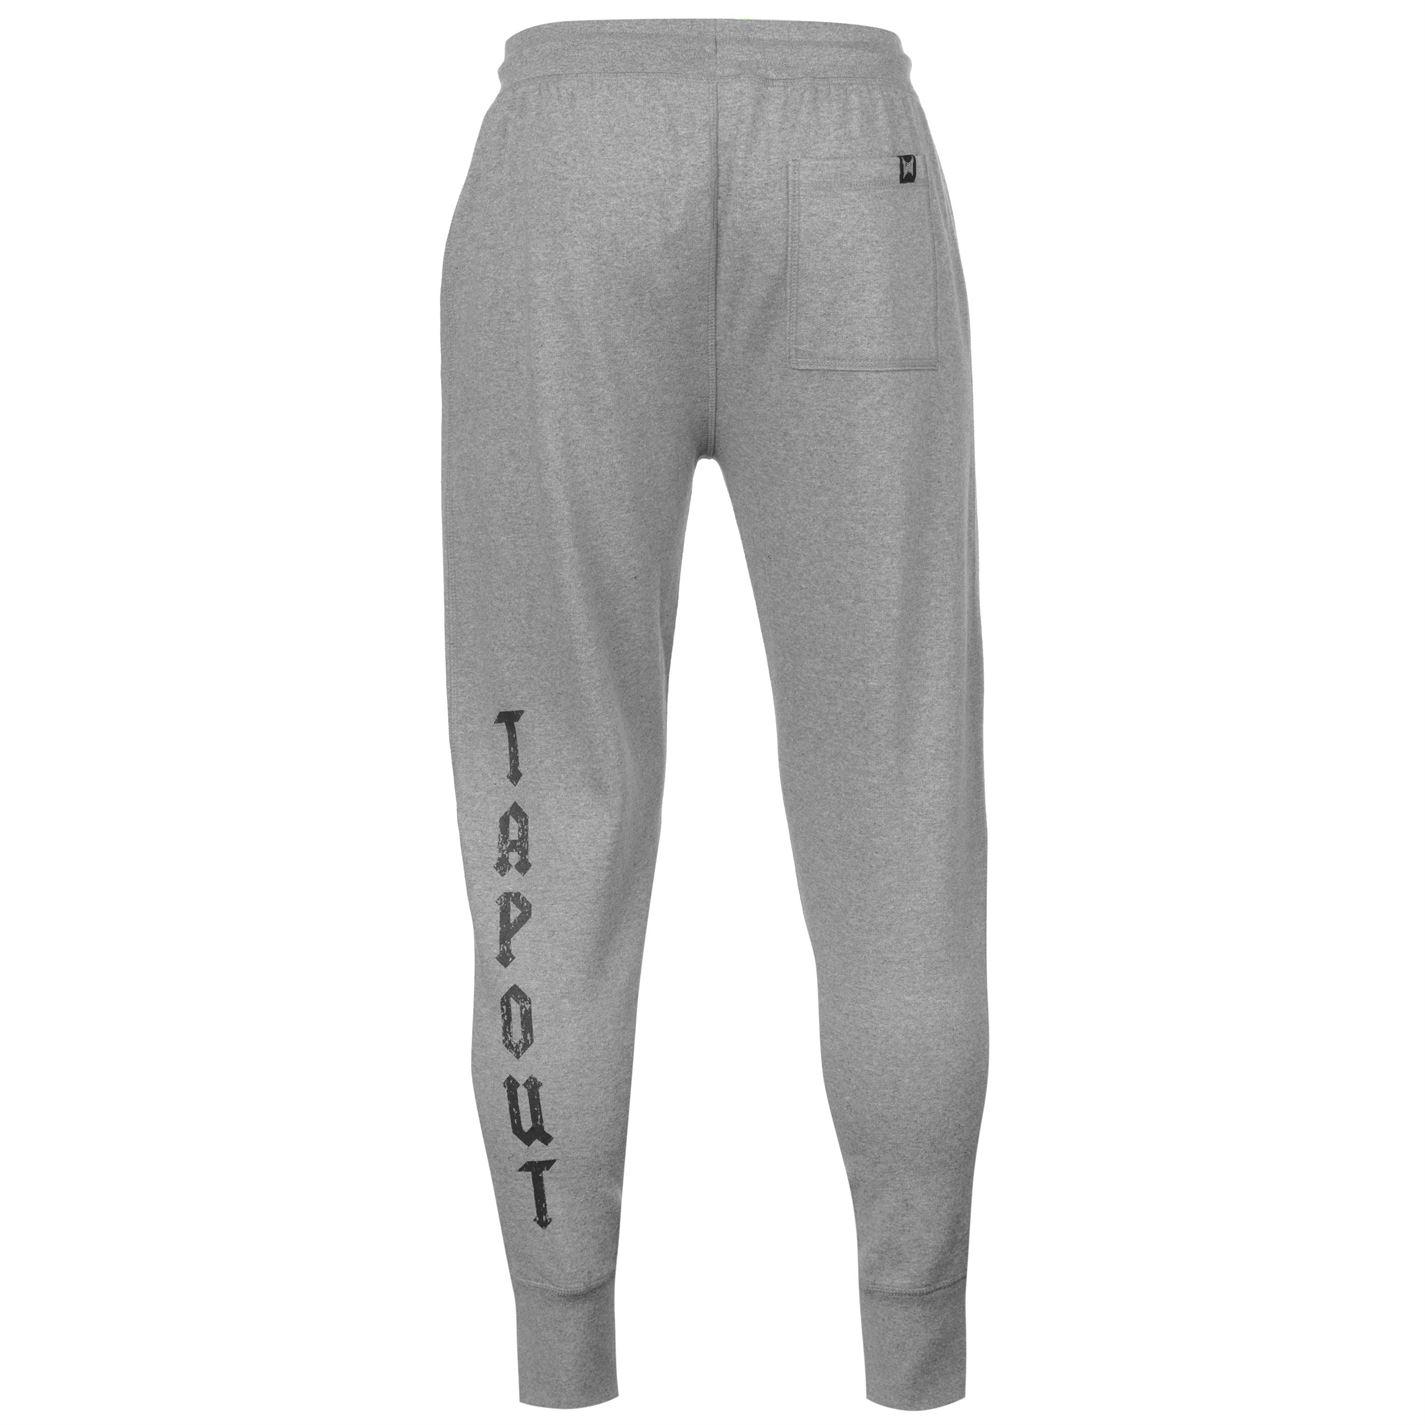 389ab6f96ce Tapout Mens Core Joggers Jersey Jogging Bottoms Trousers Pants ...